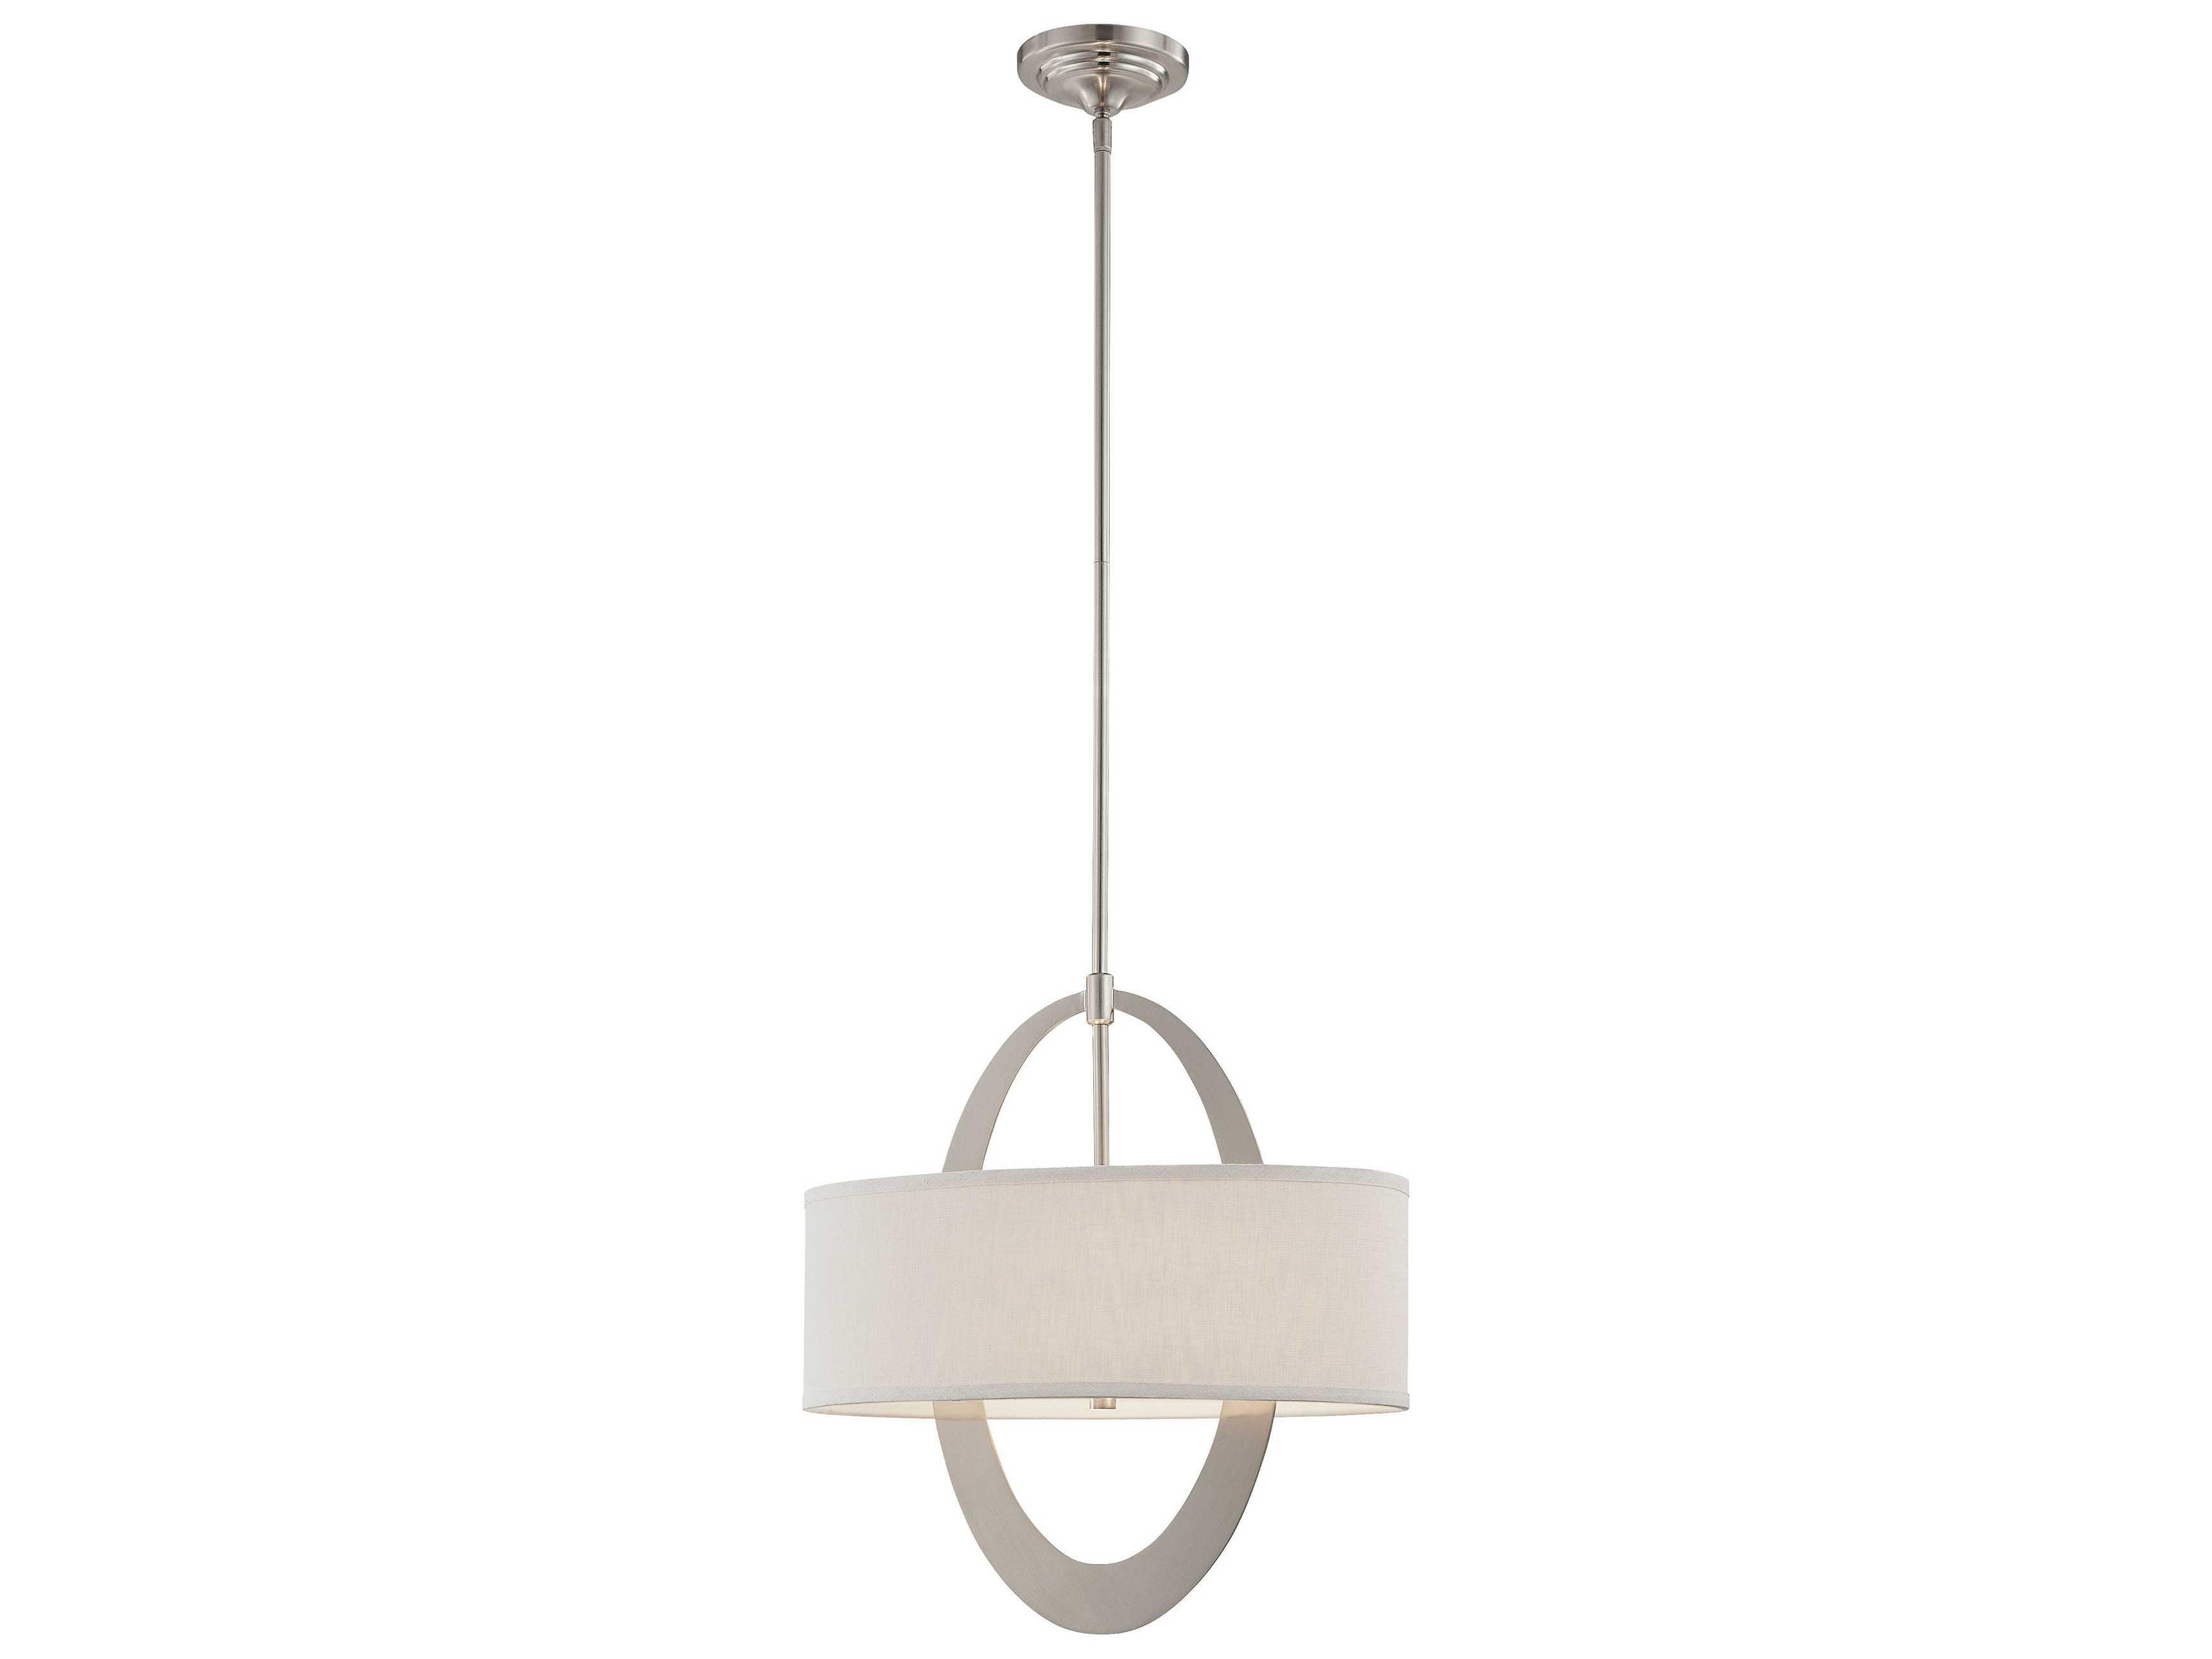 george kovacs earring brushed nickel two light 10 39 39 wide. Black Bedroom Furniture Sets. Home Design Ideas